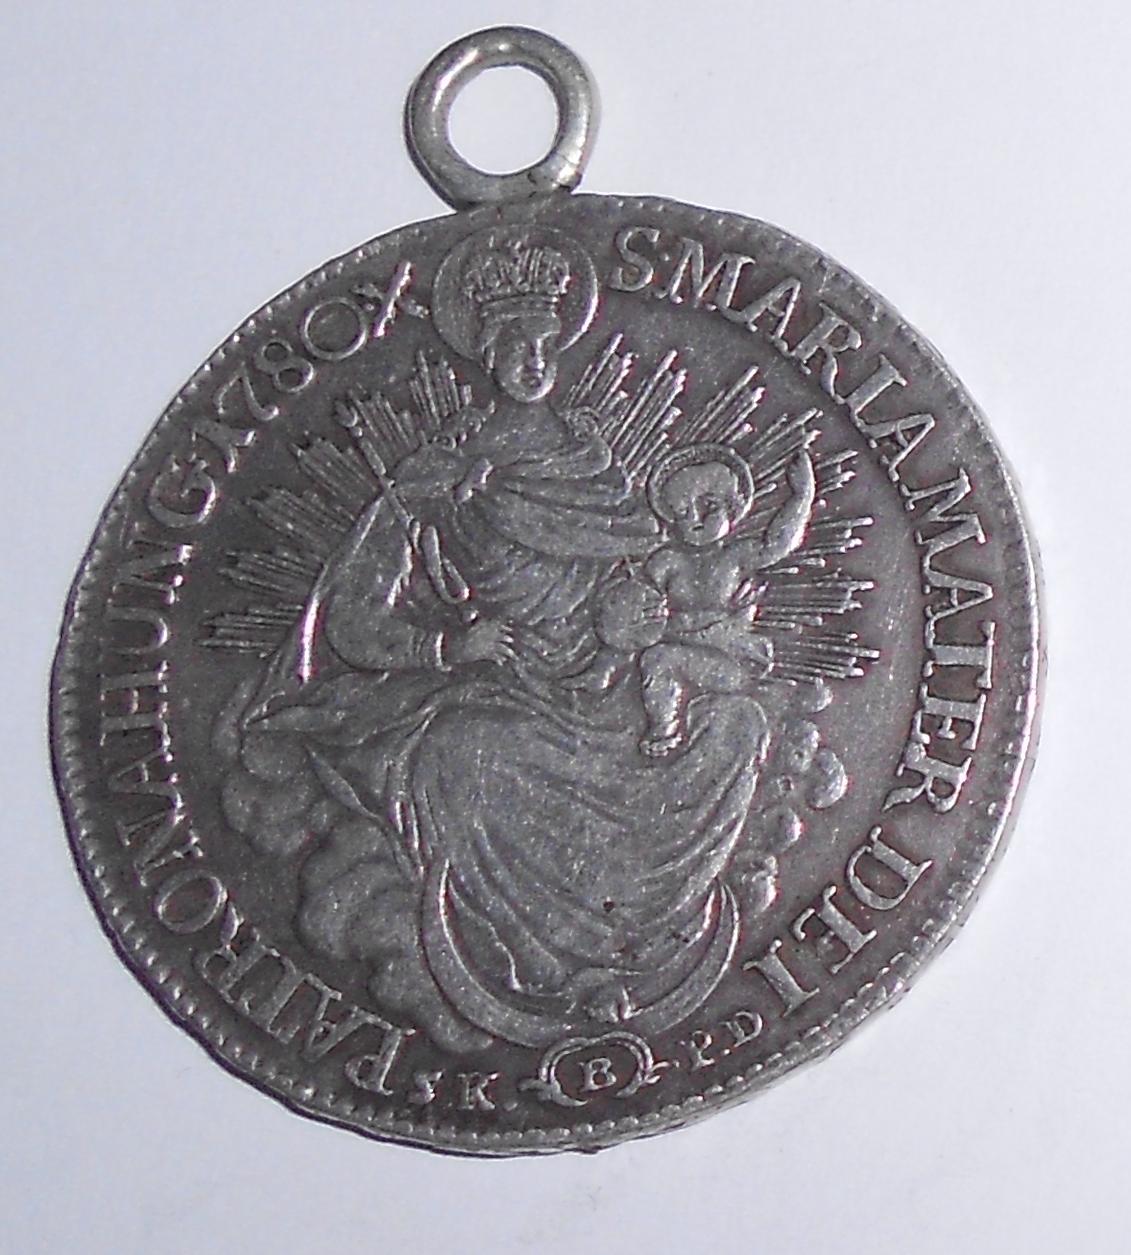 Uhry 1/2 Tolar 1780 B Marie Terezie, dobové ouško